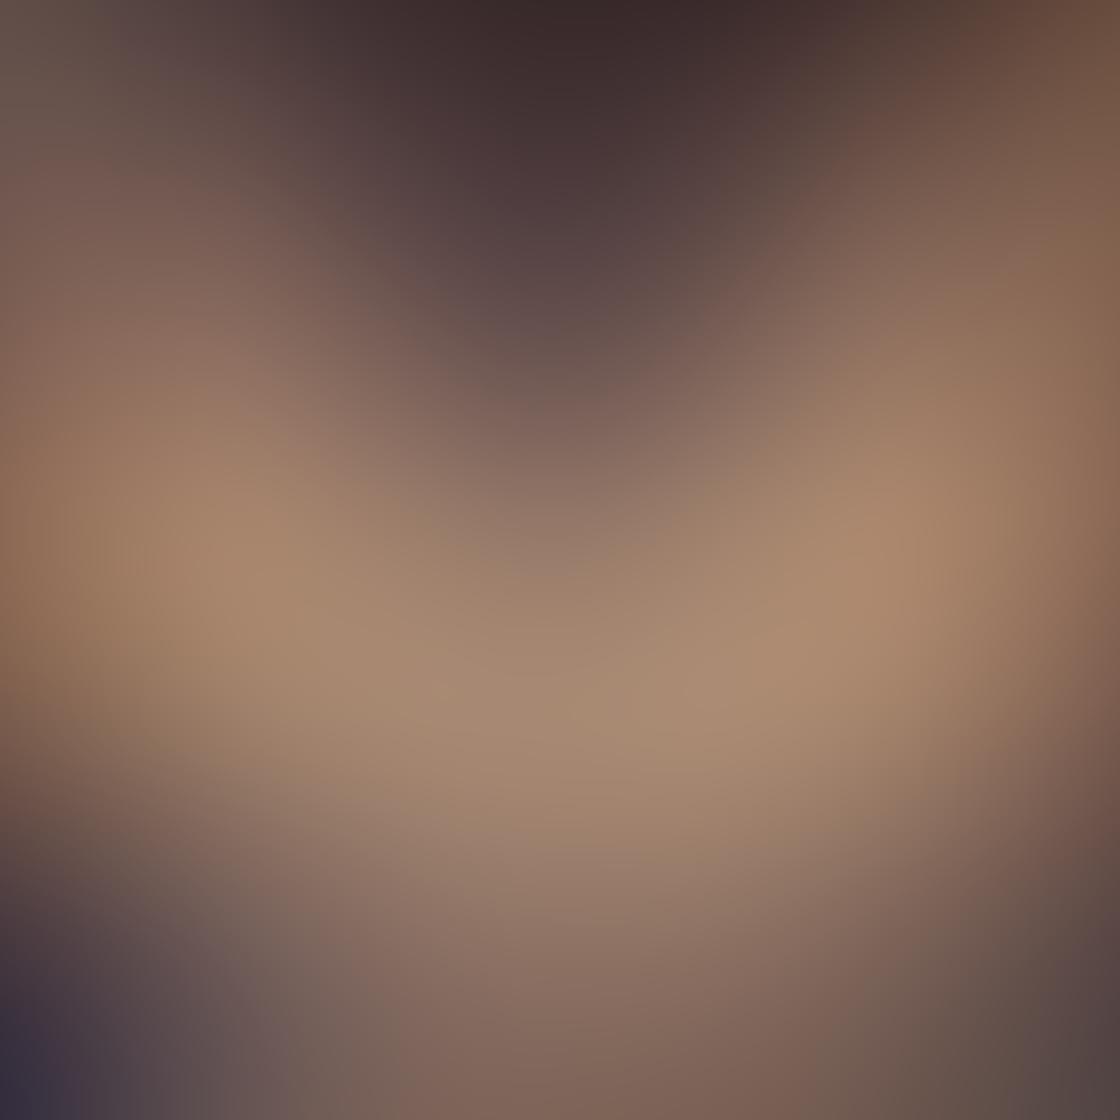 iPhone Weather Photo 19